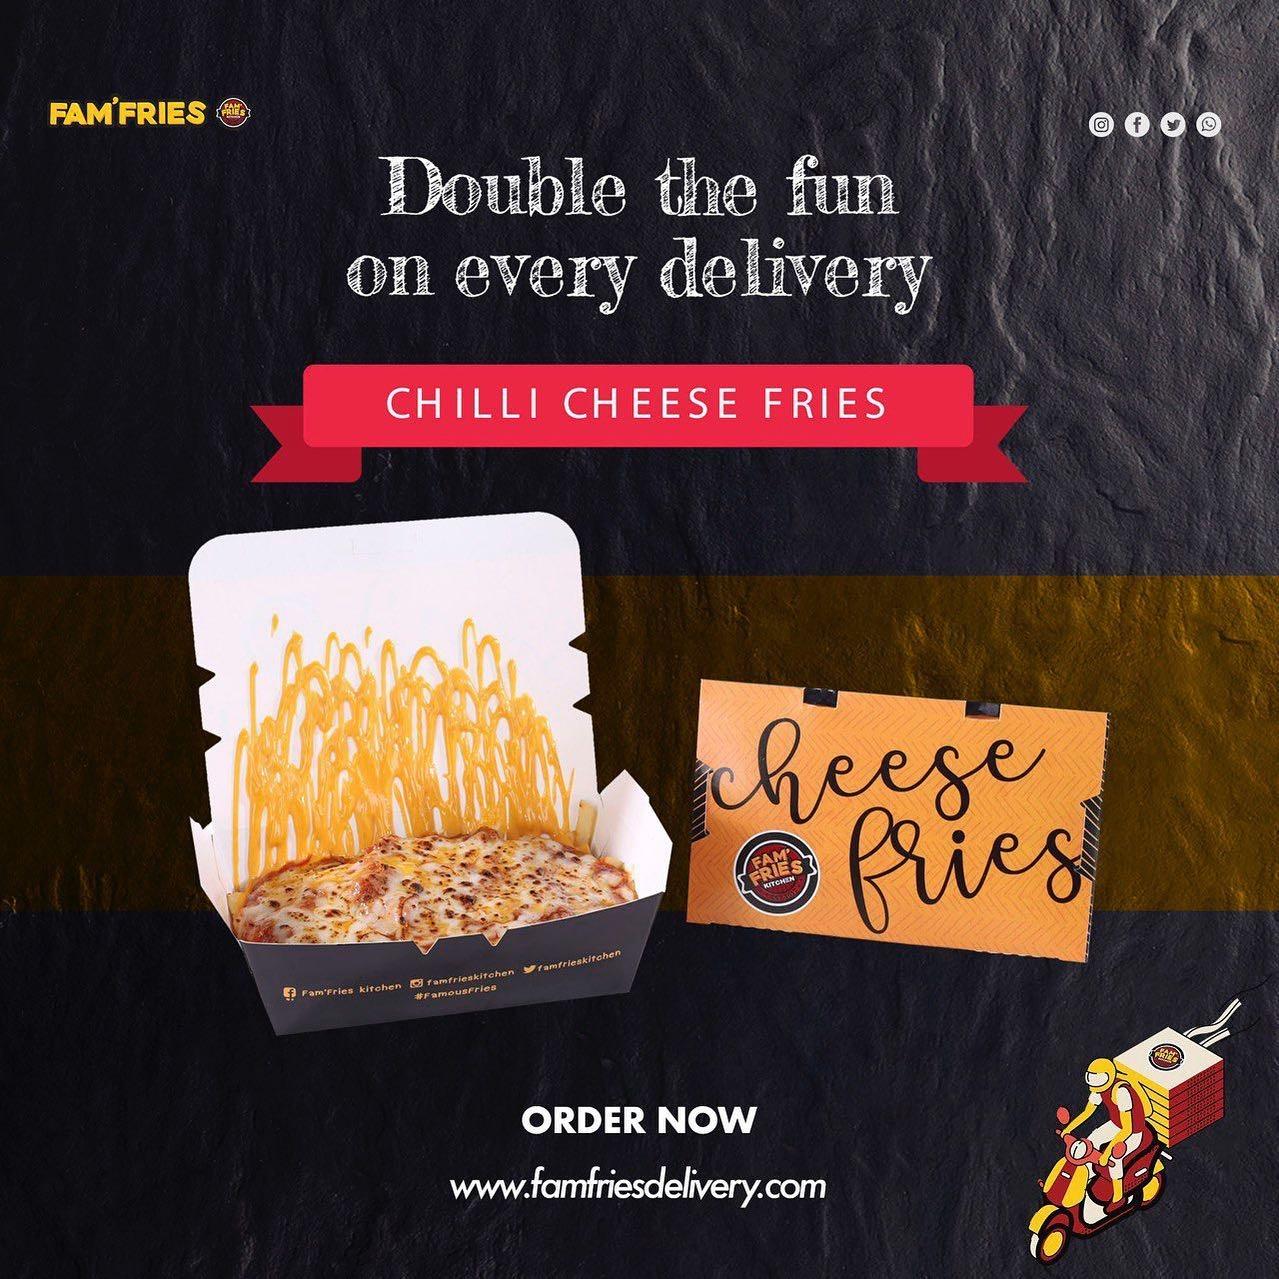 Fam' Fries Kitchen